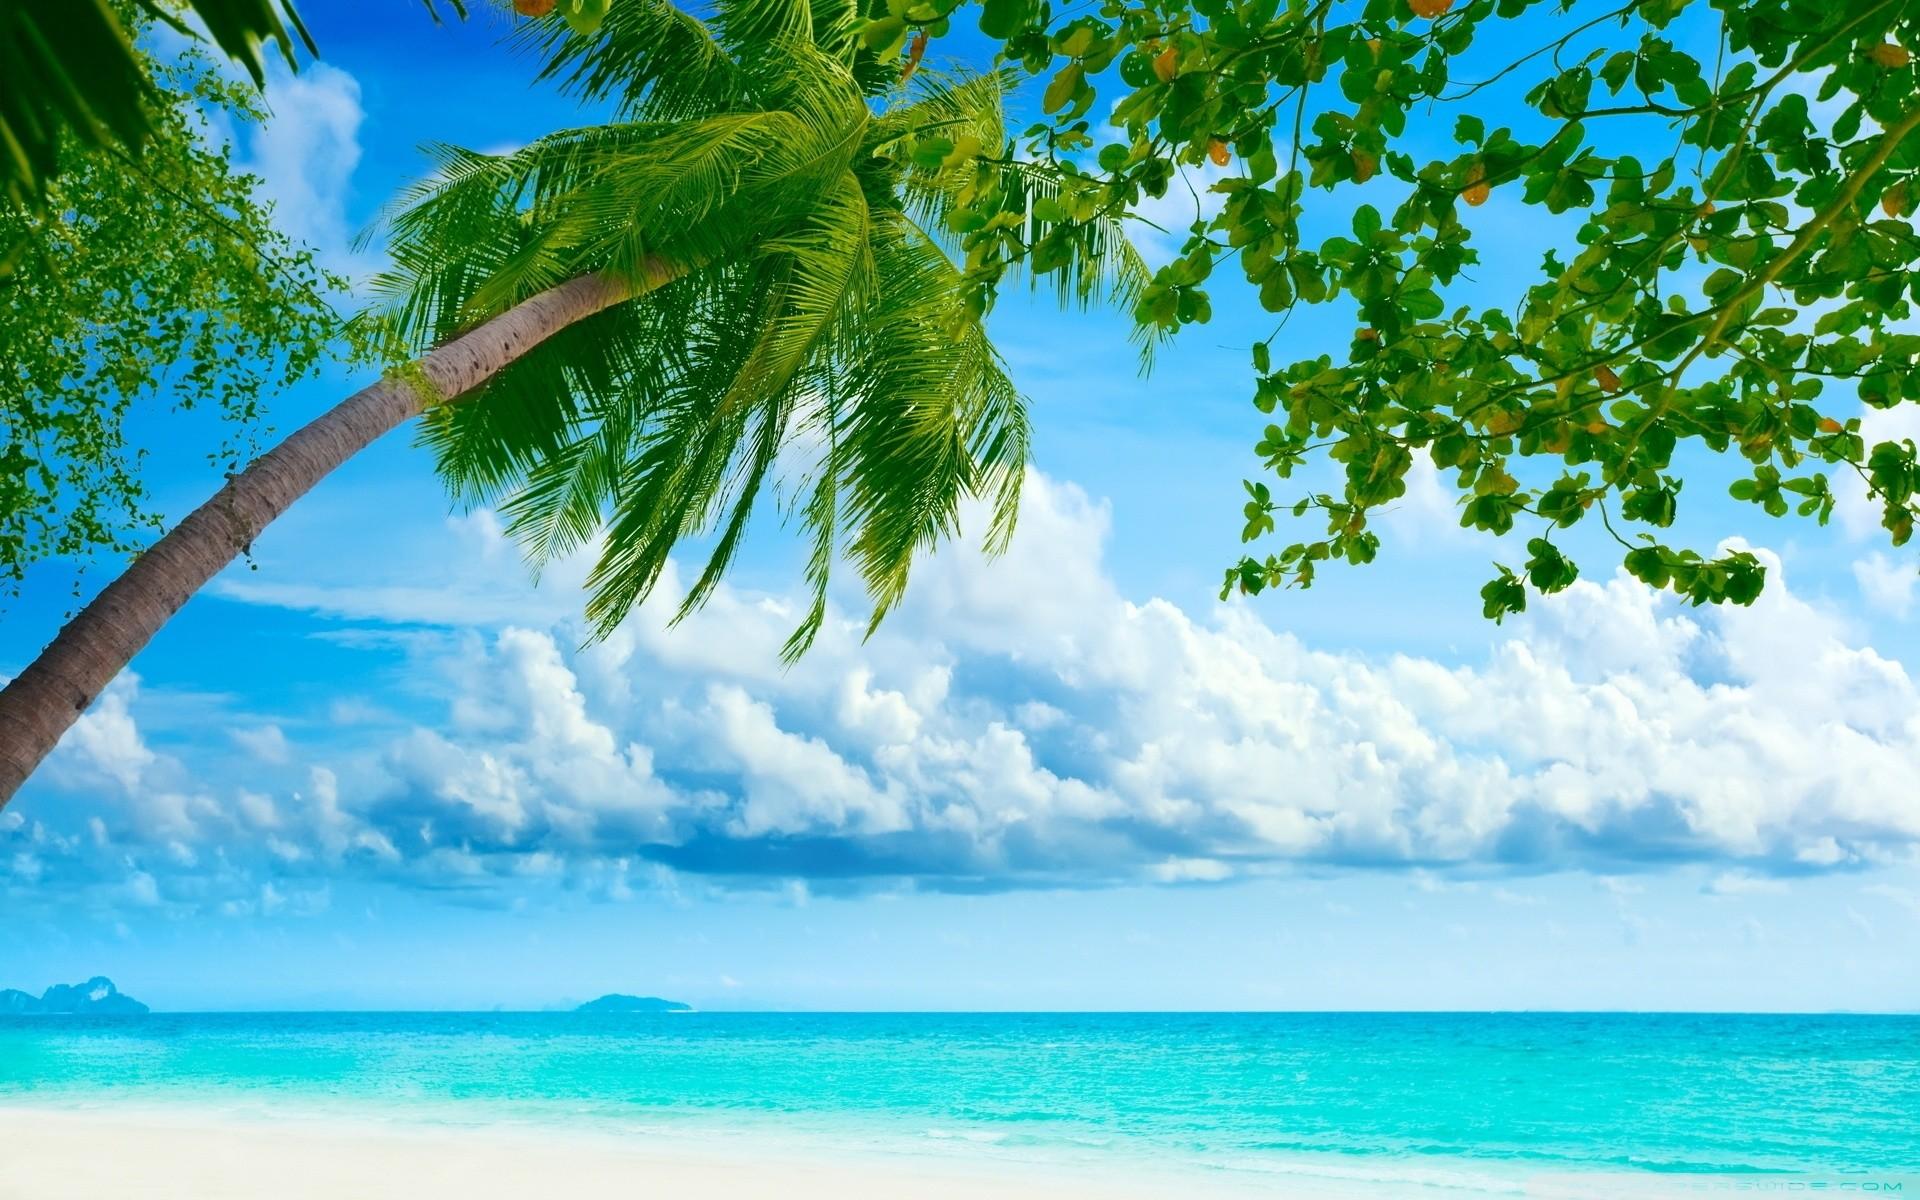 Tropical Beach Resorts HD Wide Wallpaper for Widescreen